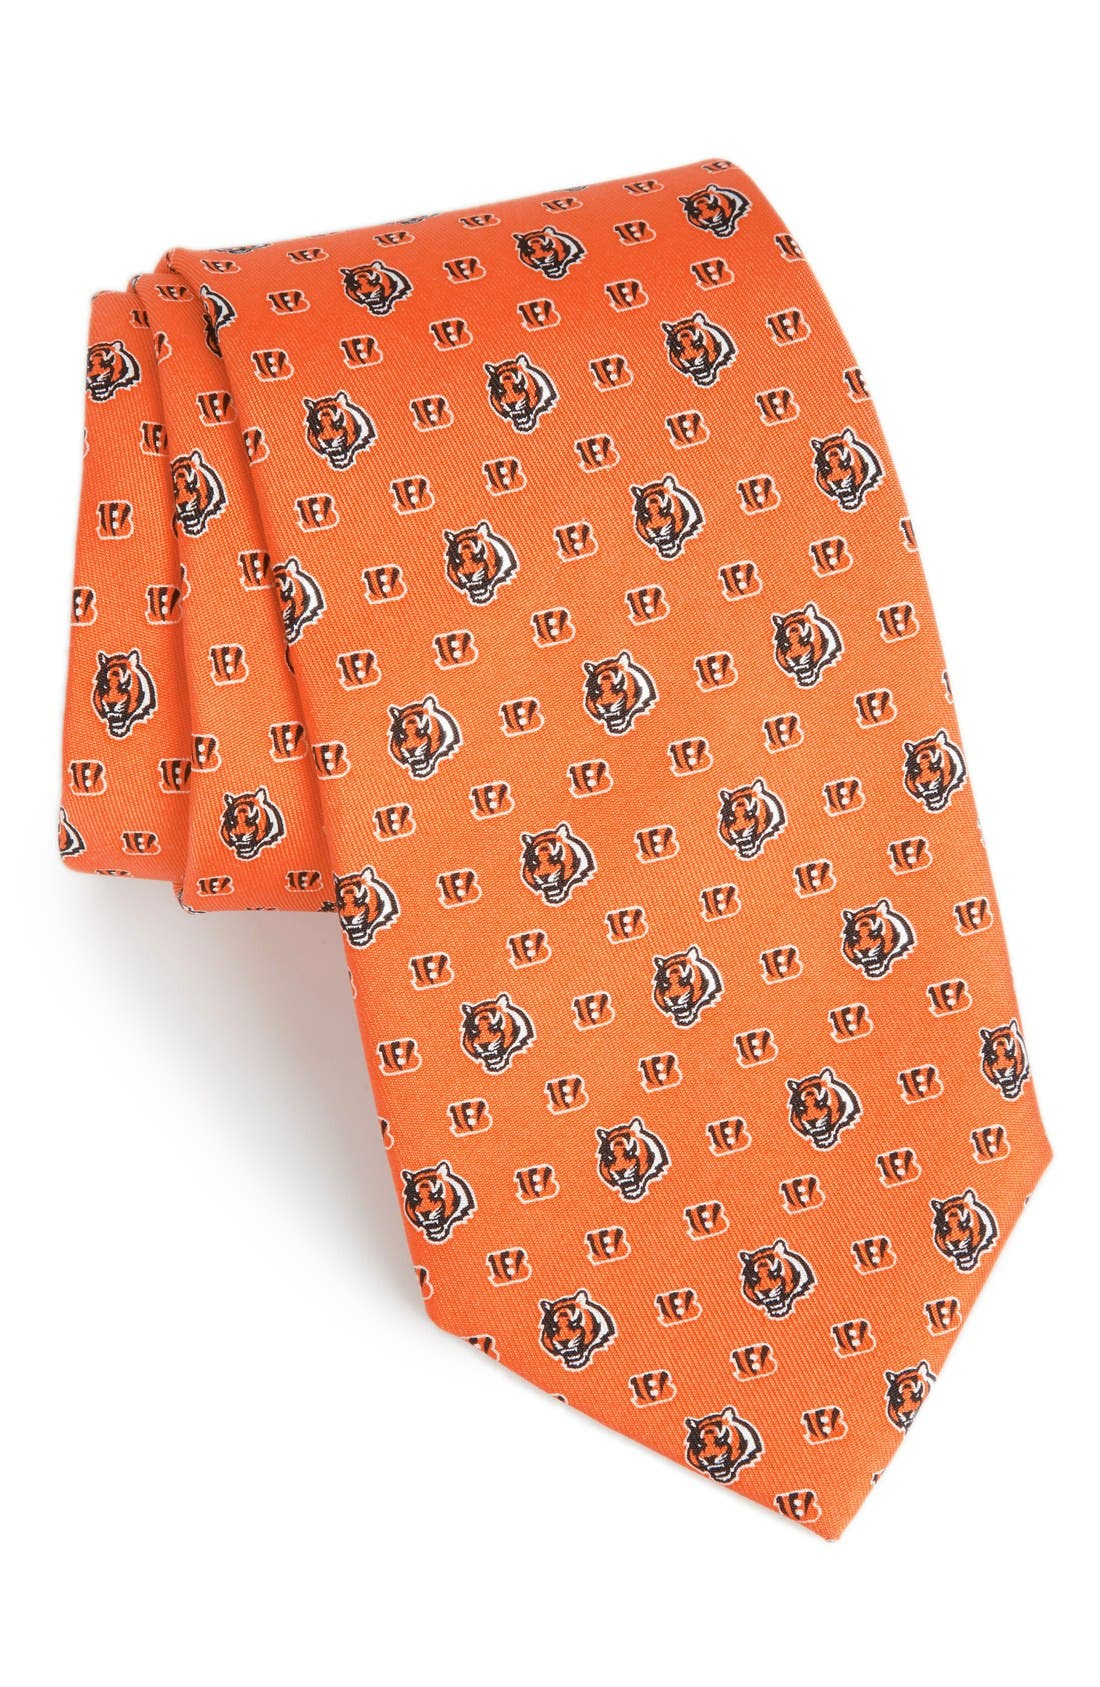 Cincinnati Bengals - NFL Woven Silk Tie,                             Main thumbnail 1, color,                             ORANGE